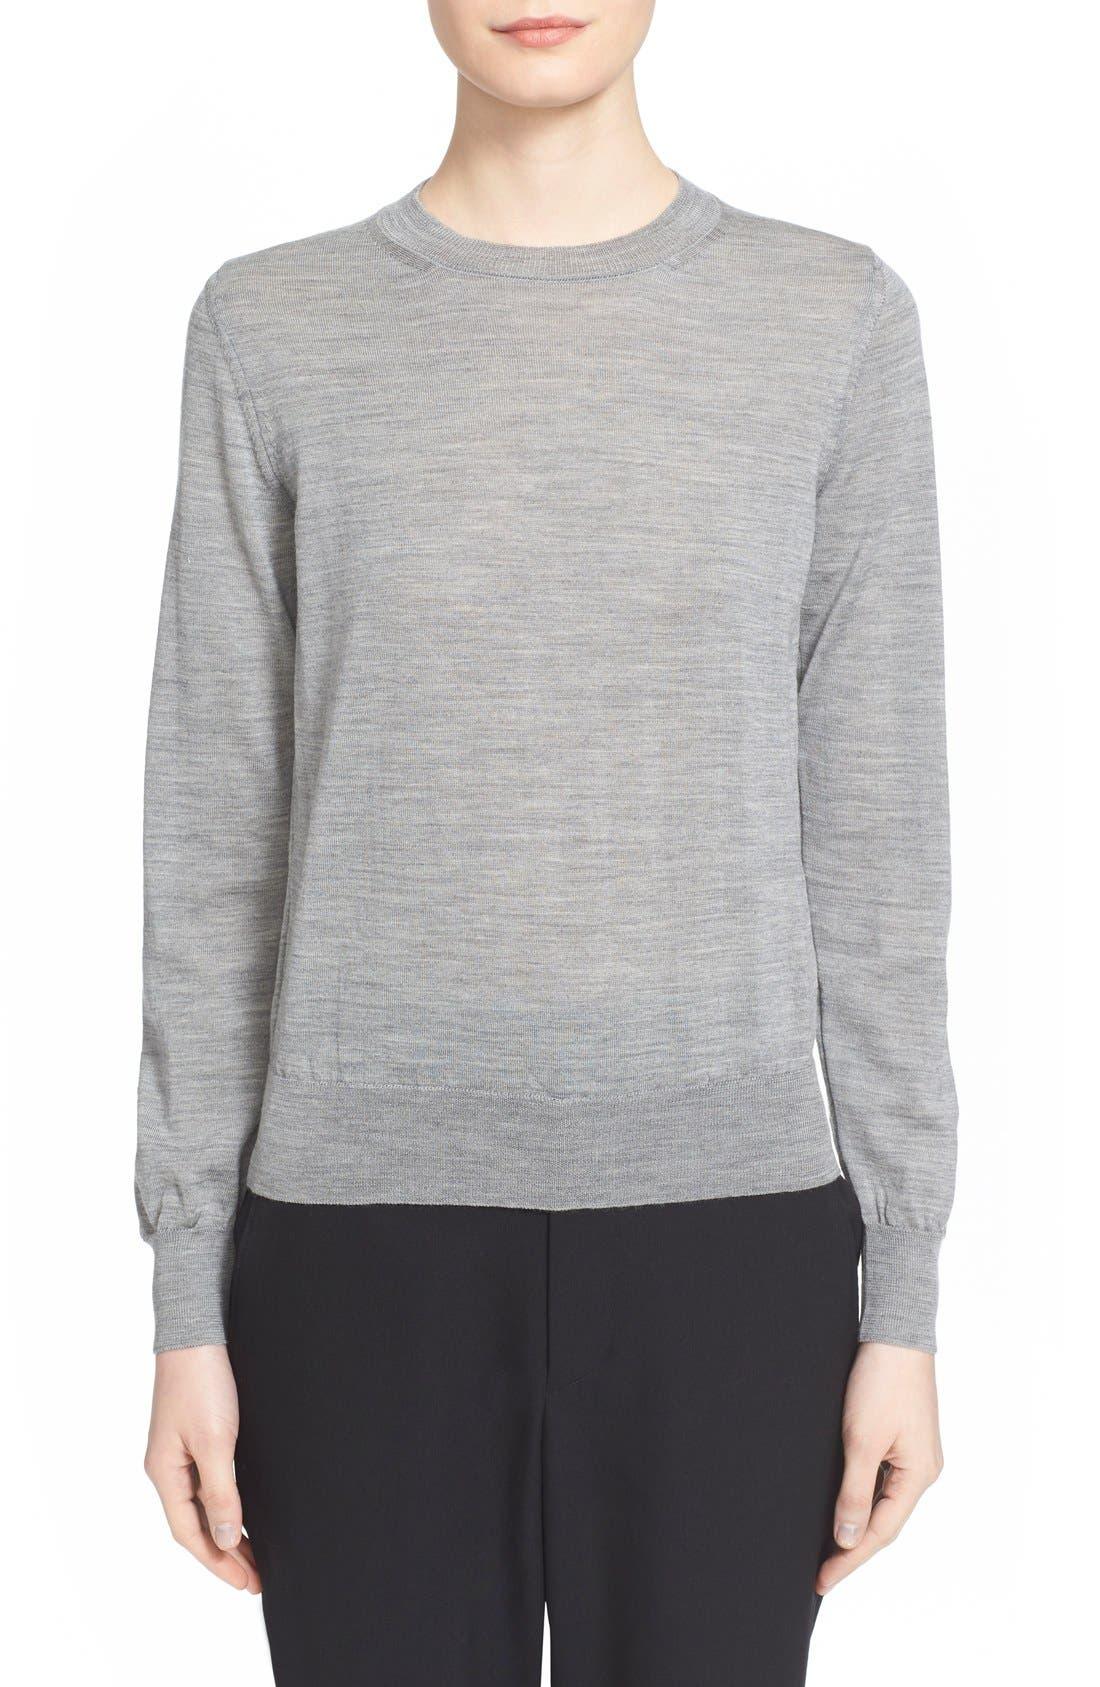 Alternate Image 1 Selected - Comme des Garçons Crewneck Wool Pullover